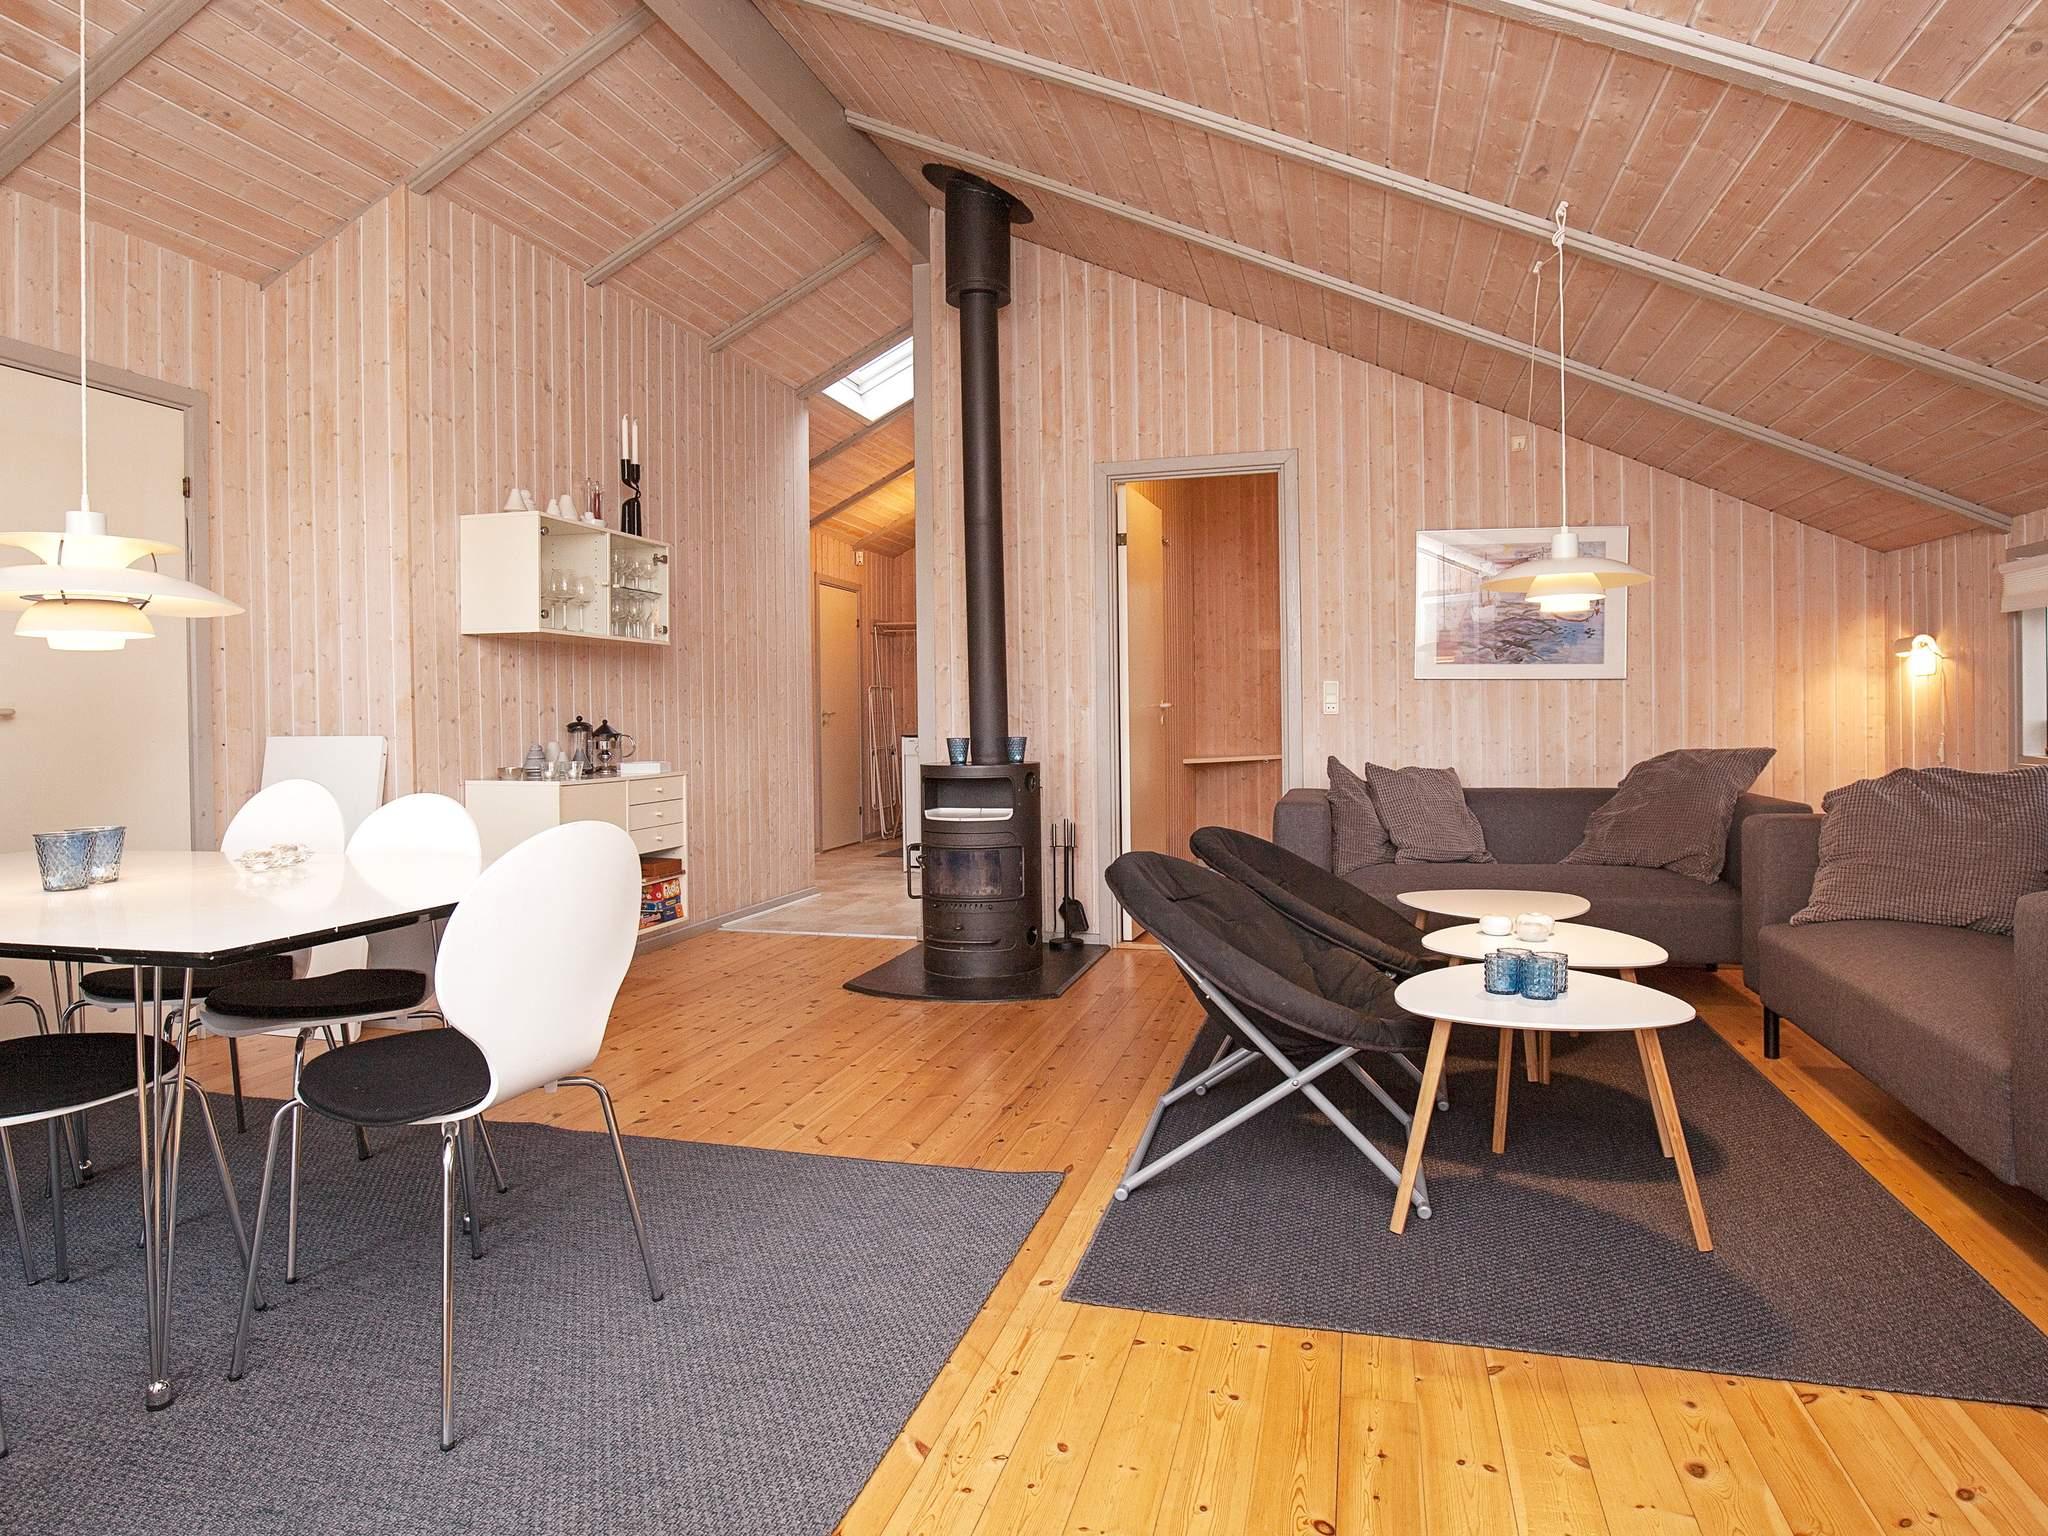 Ferienhaus Melby (83177), Melby, , Nordseeland, Dänemark, Bild 4